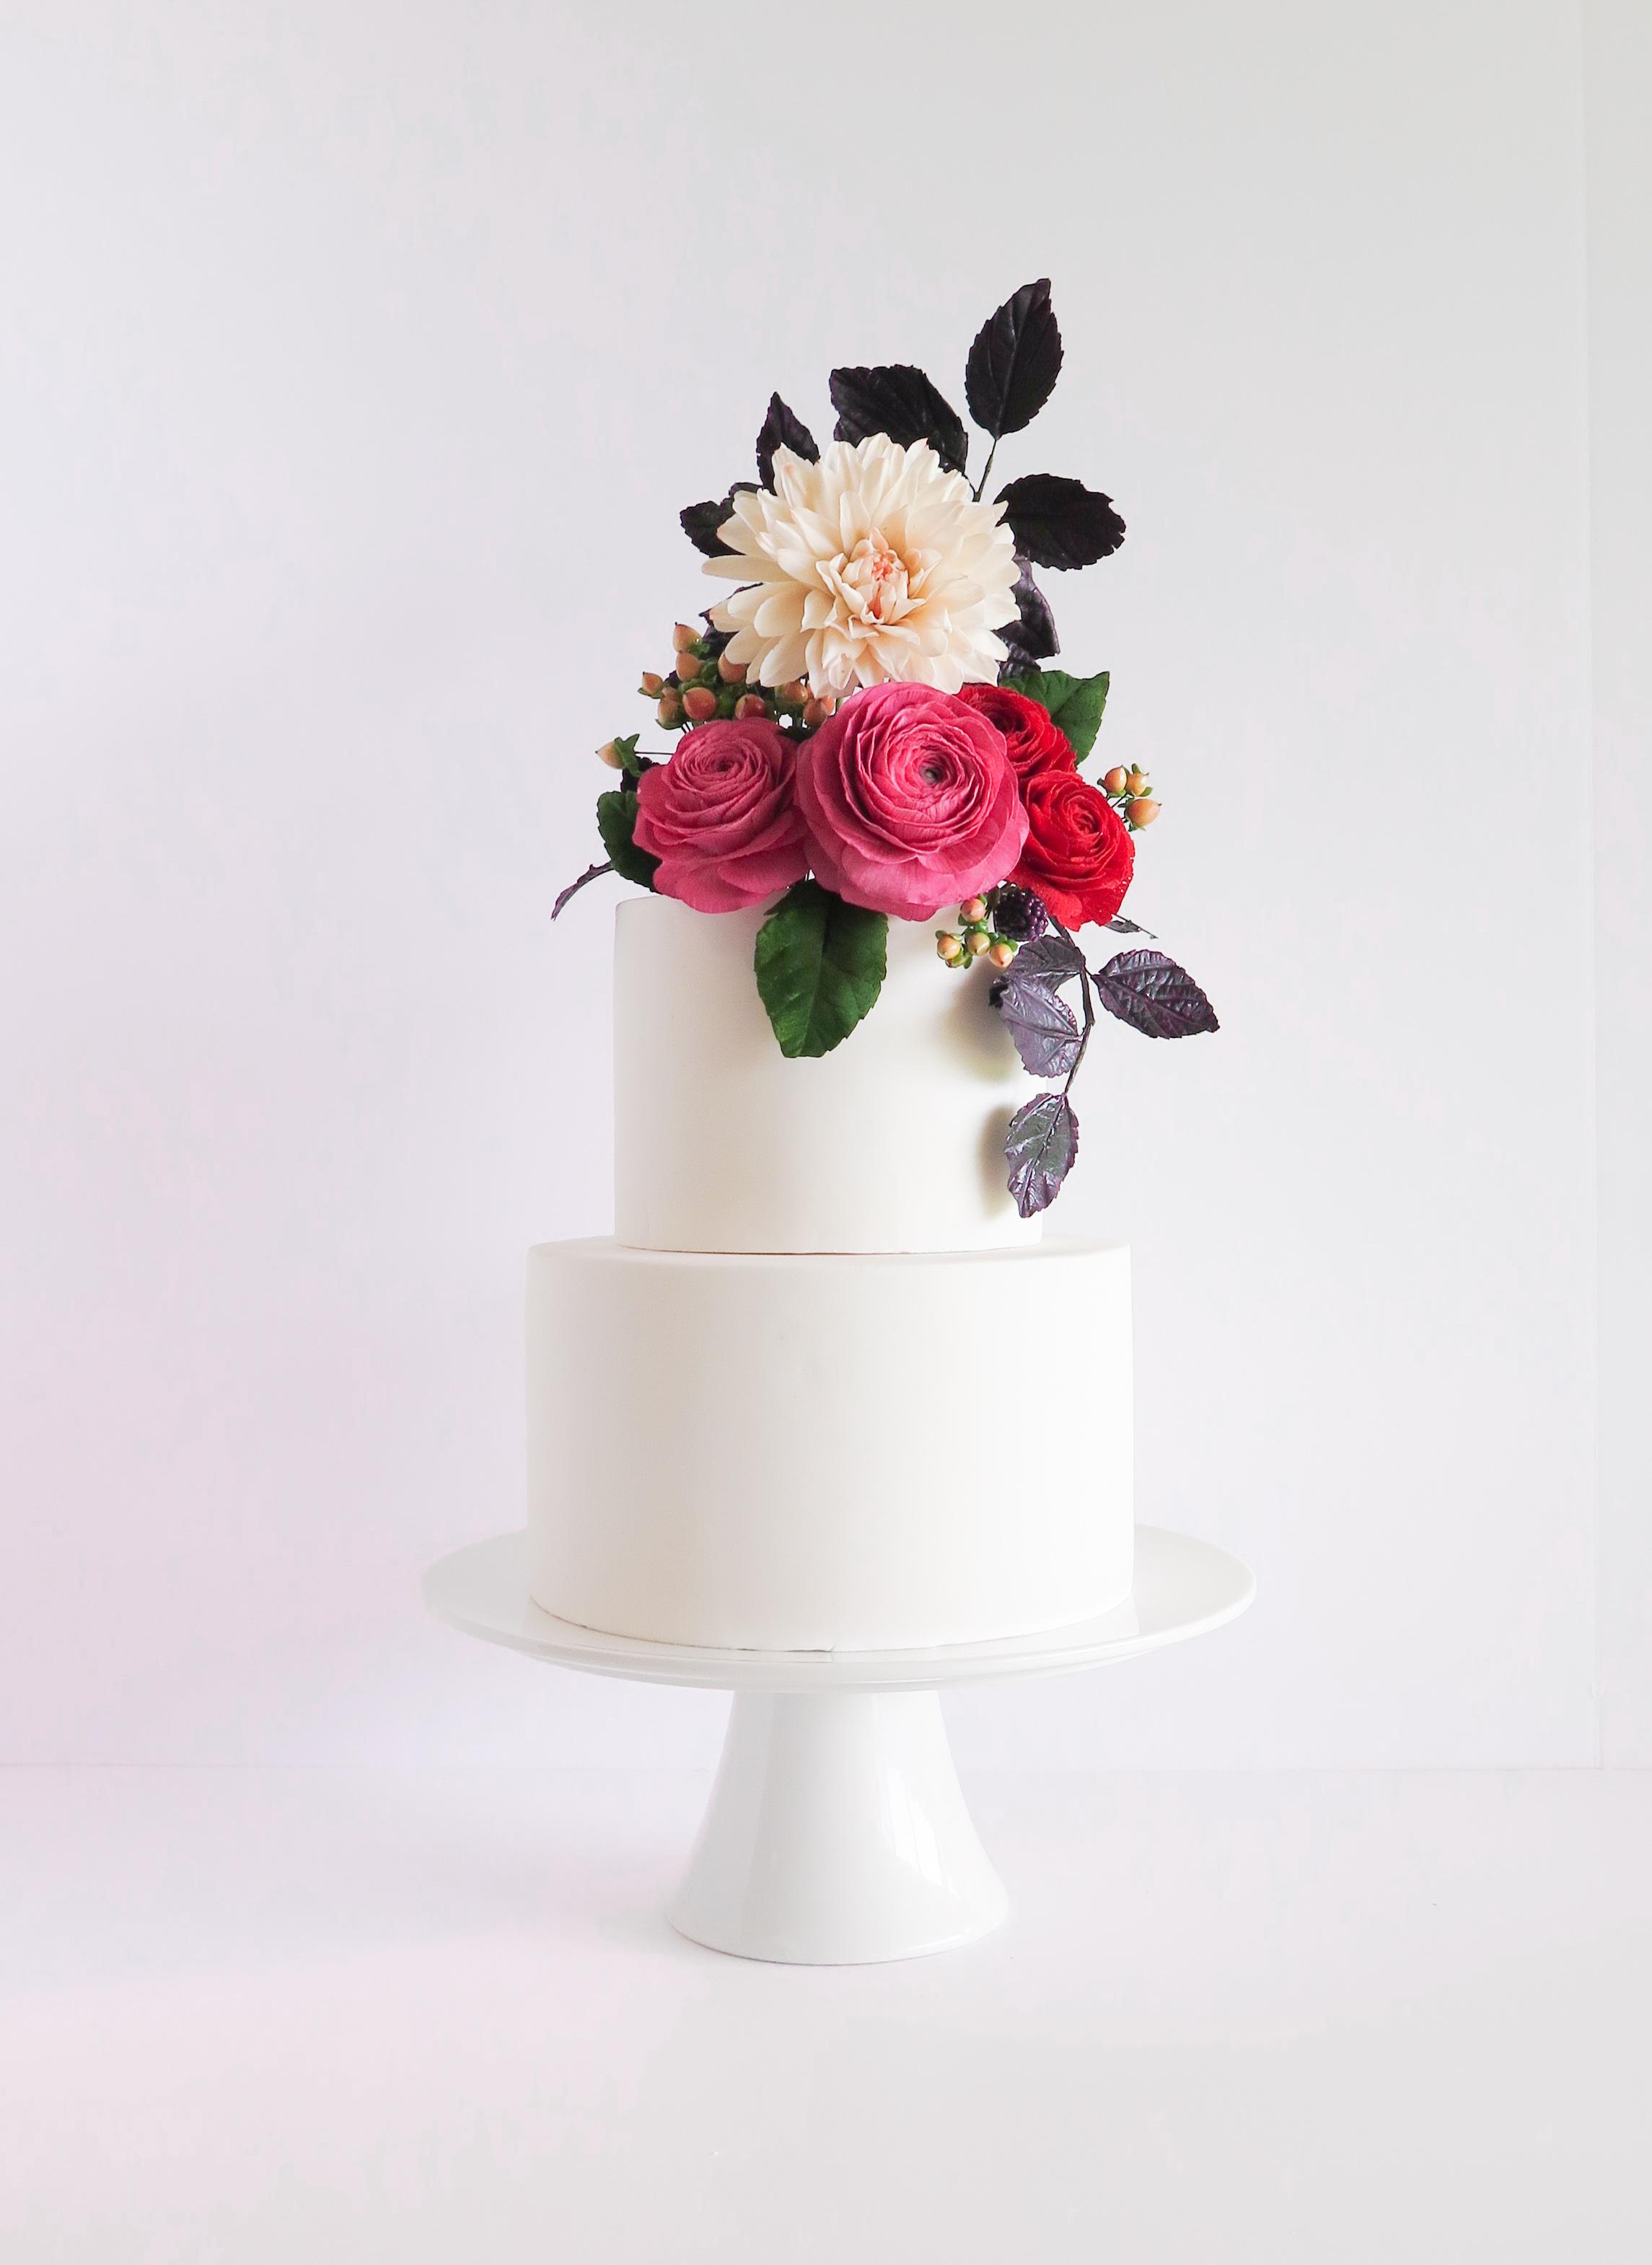 White wedding with pink sugar flower bouquet on top